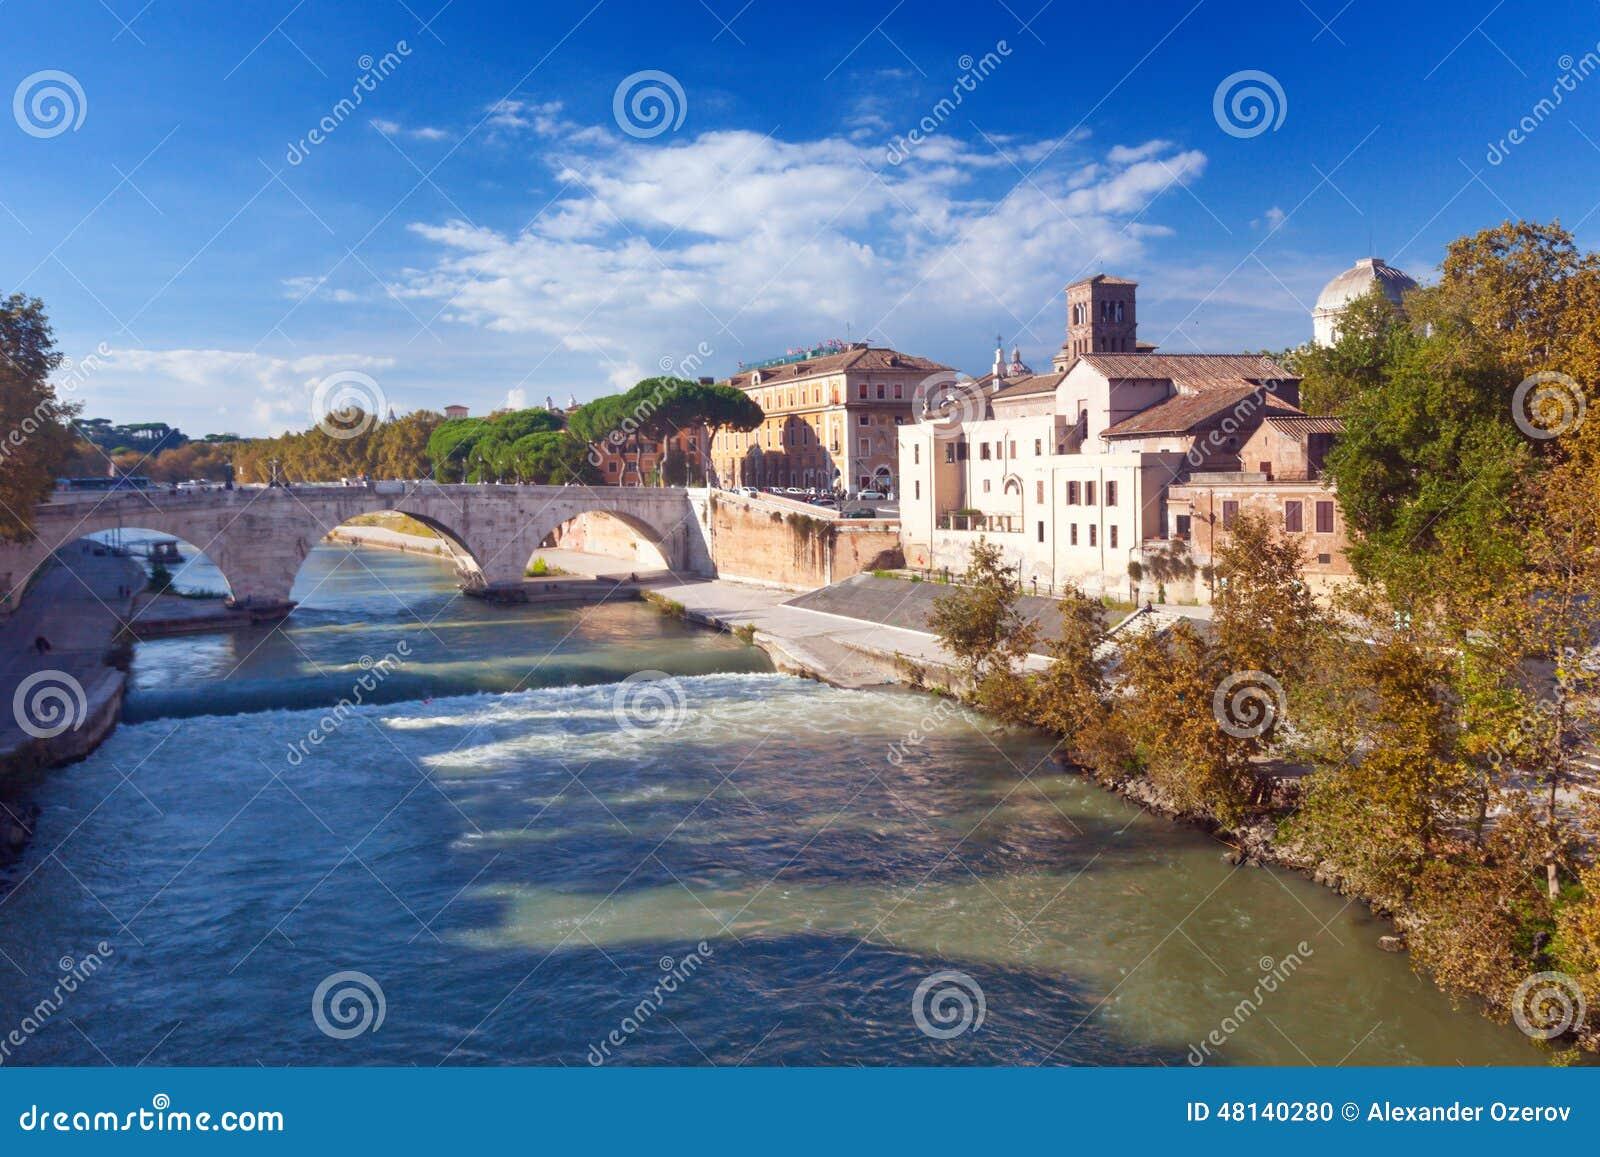 Остров Тибра и мост Cestius варолиева моста в Риме